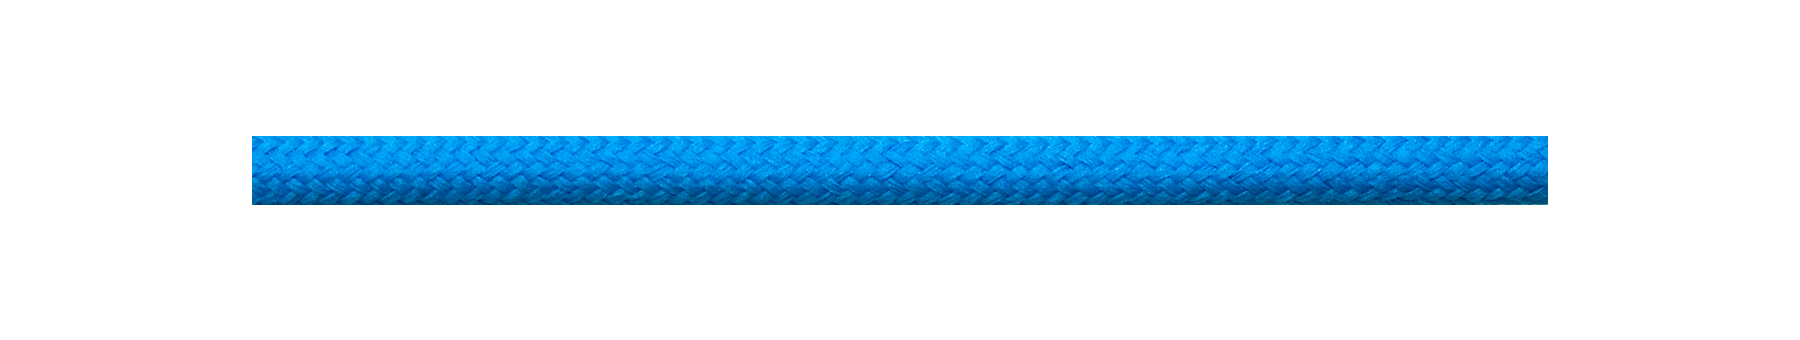 Textile Cable Blue-Turquoise